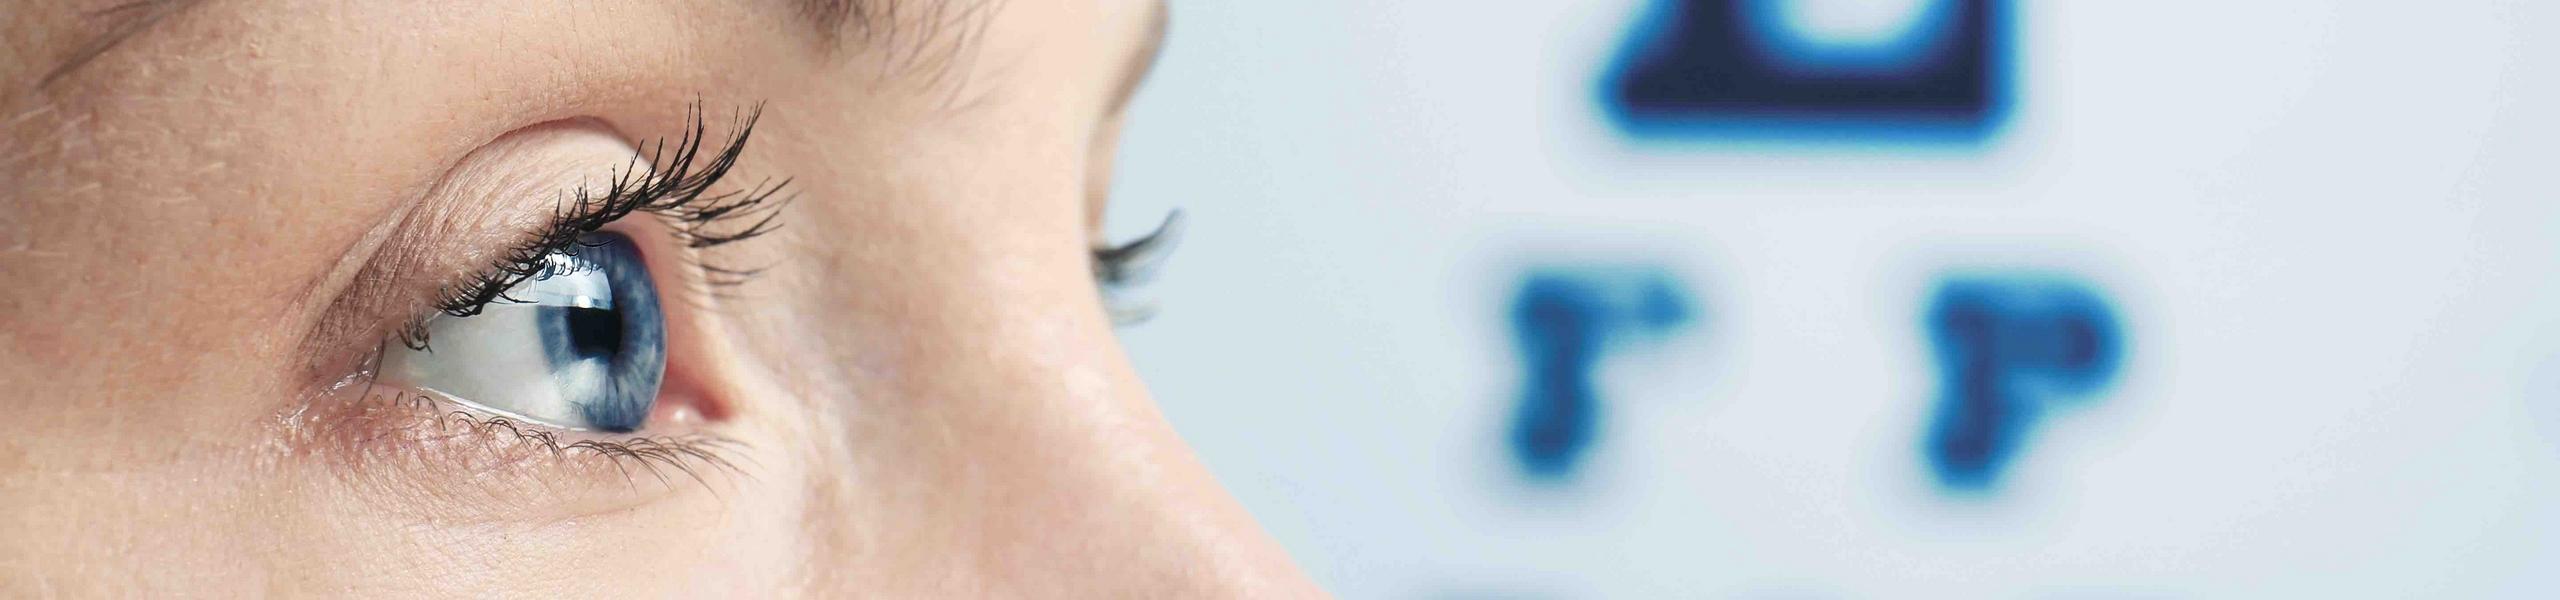 Ophtalmologie Dc Martiano